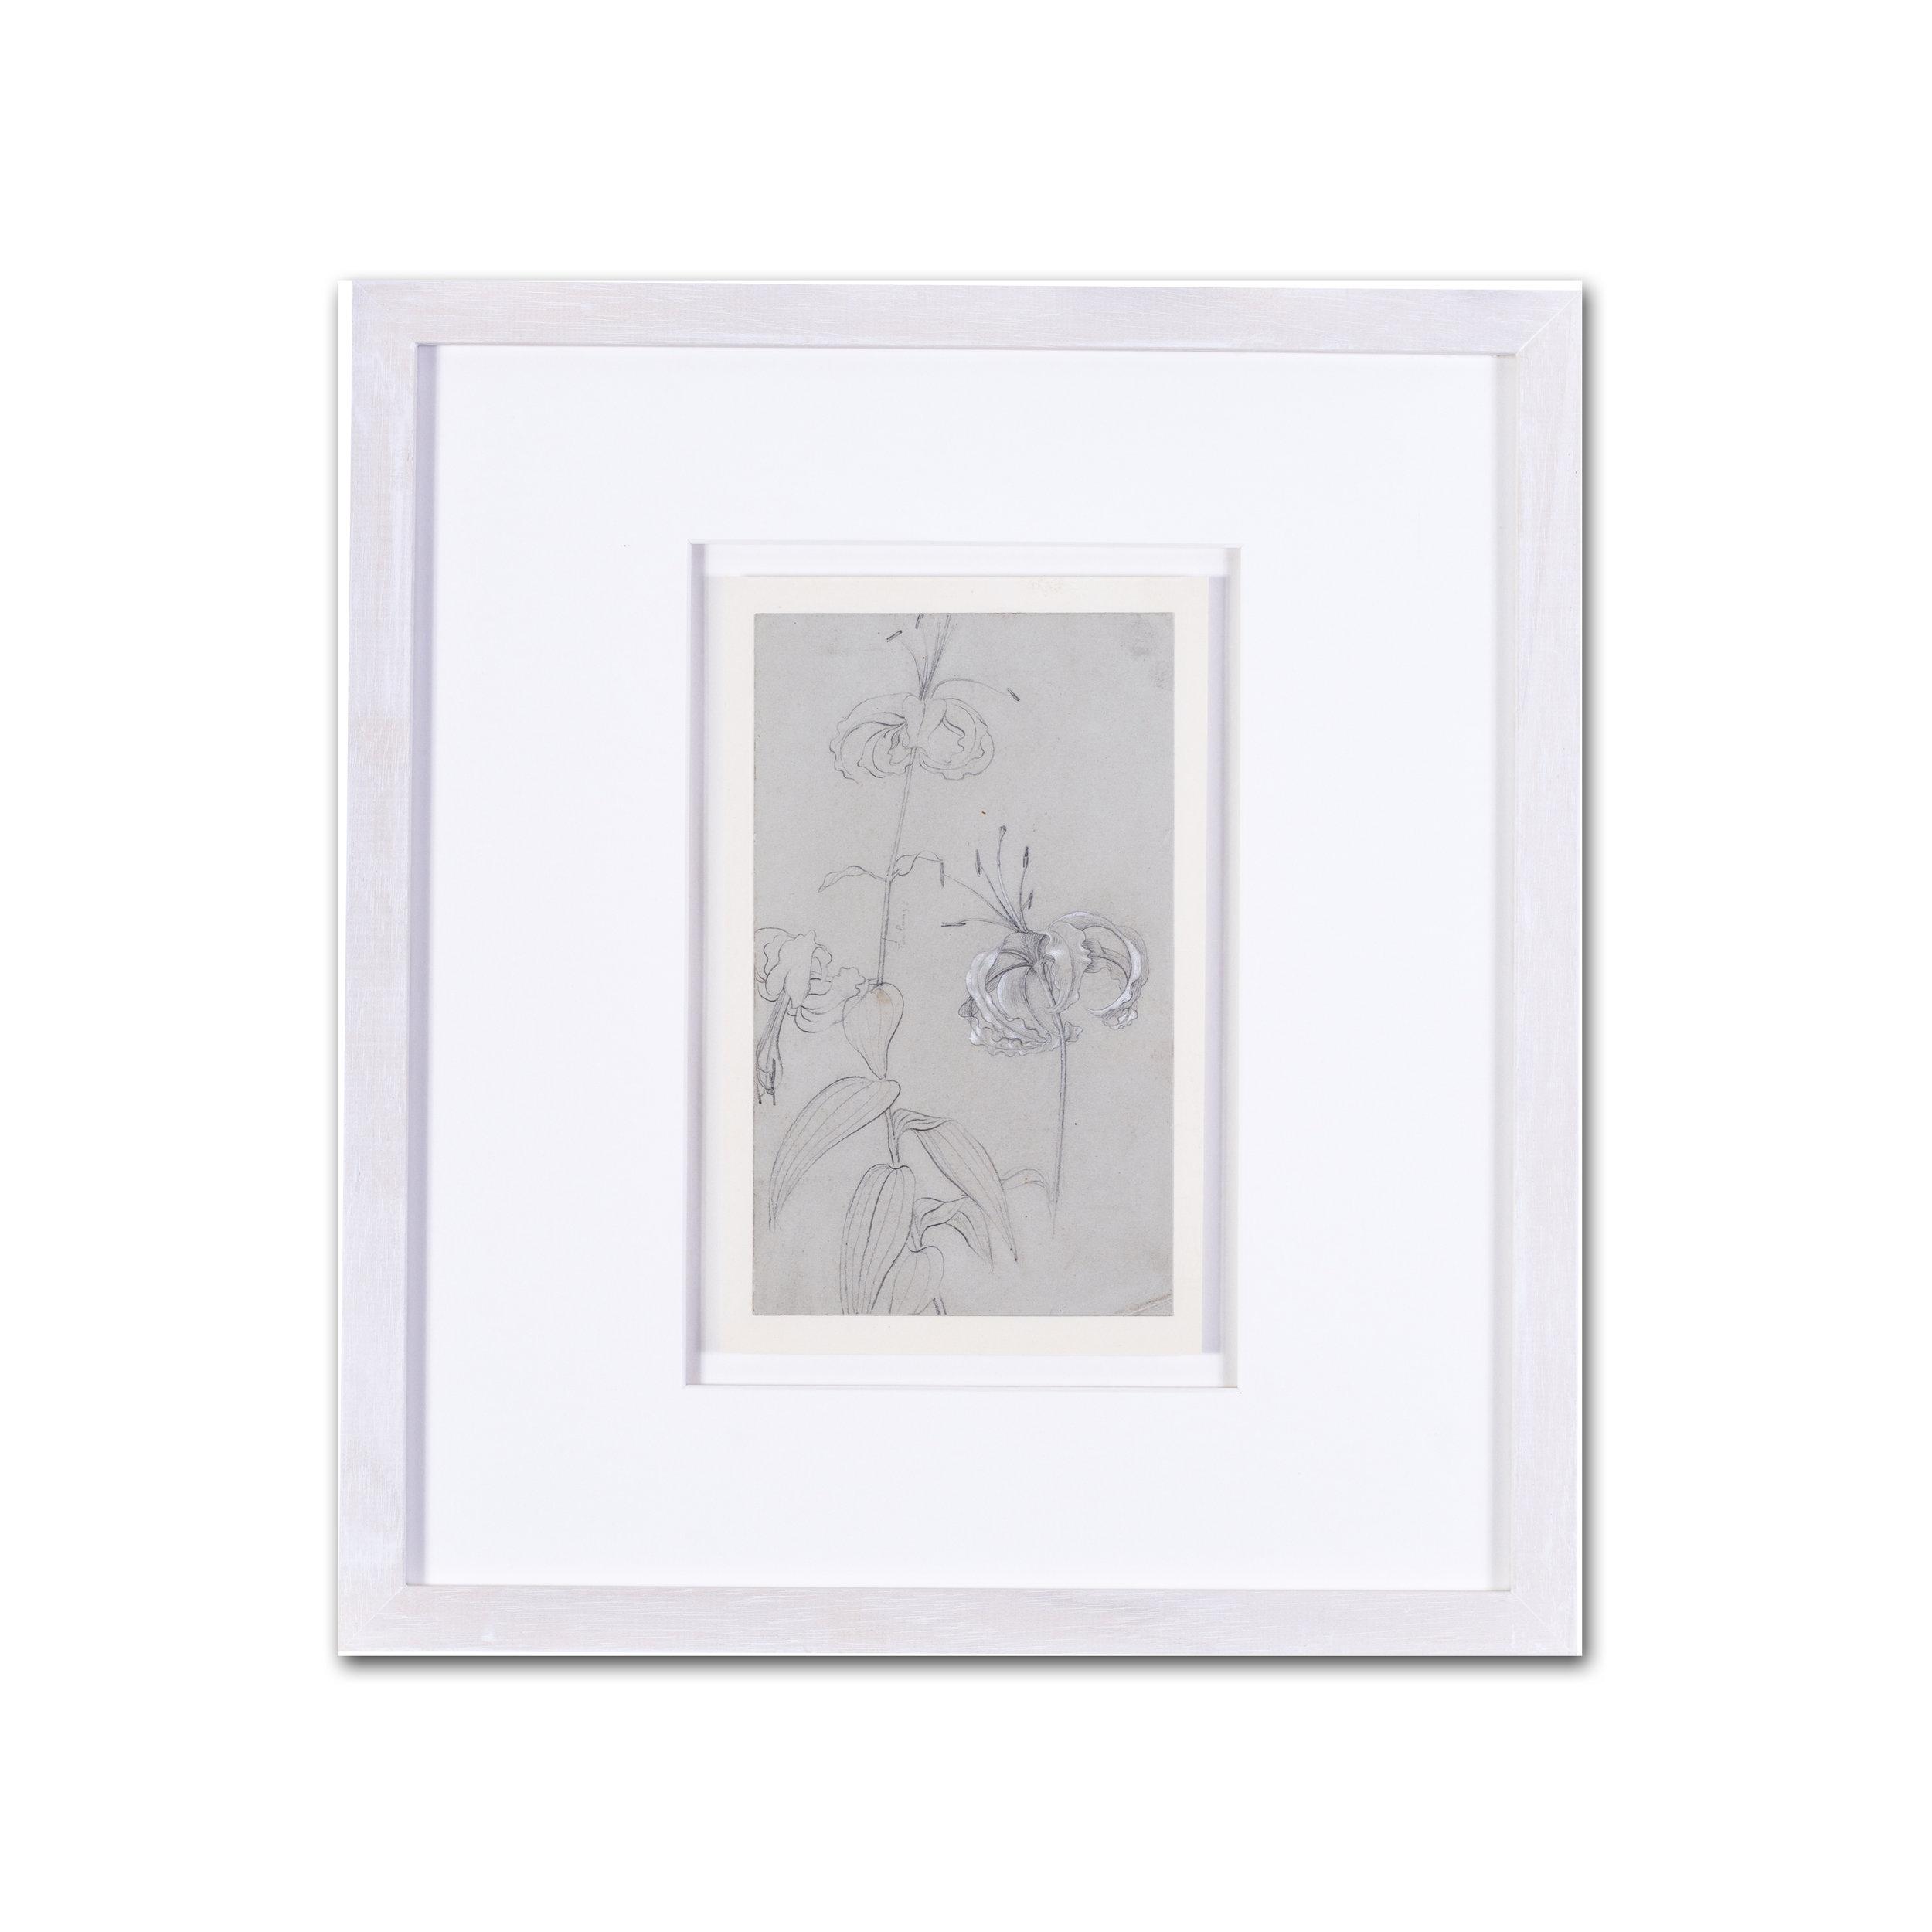 Evelyn de Morgan  Lilies  Price: £2,000